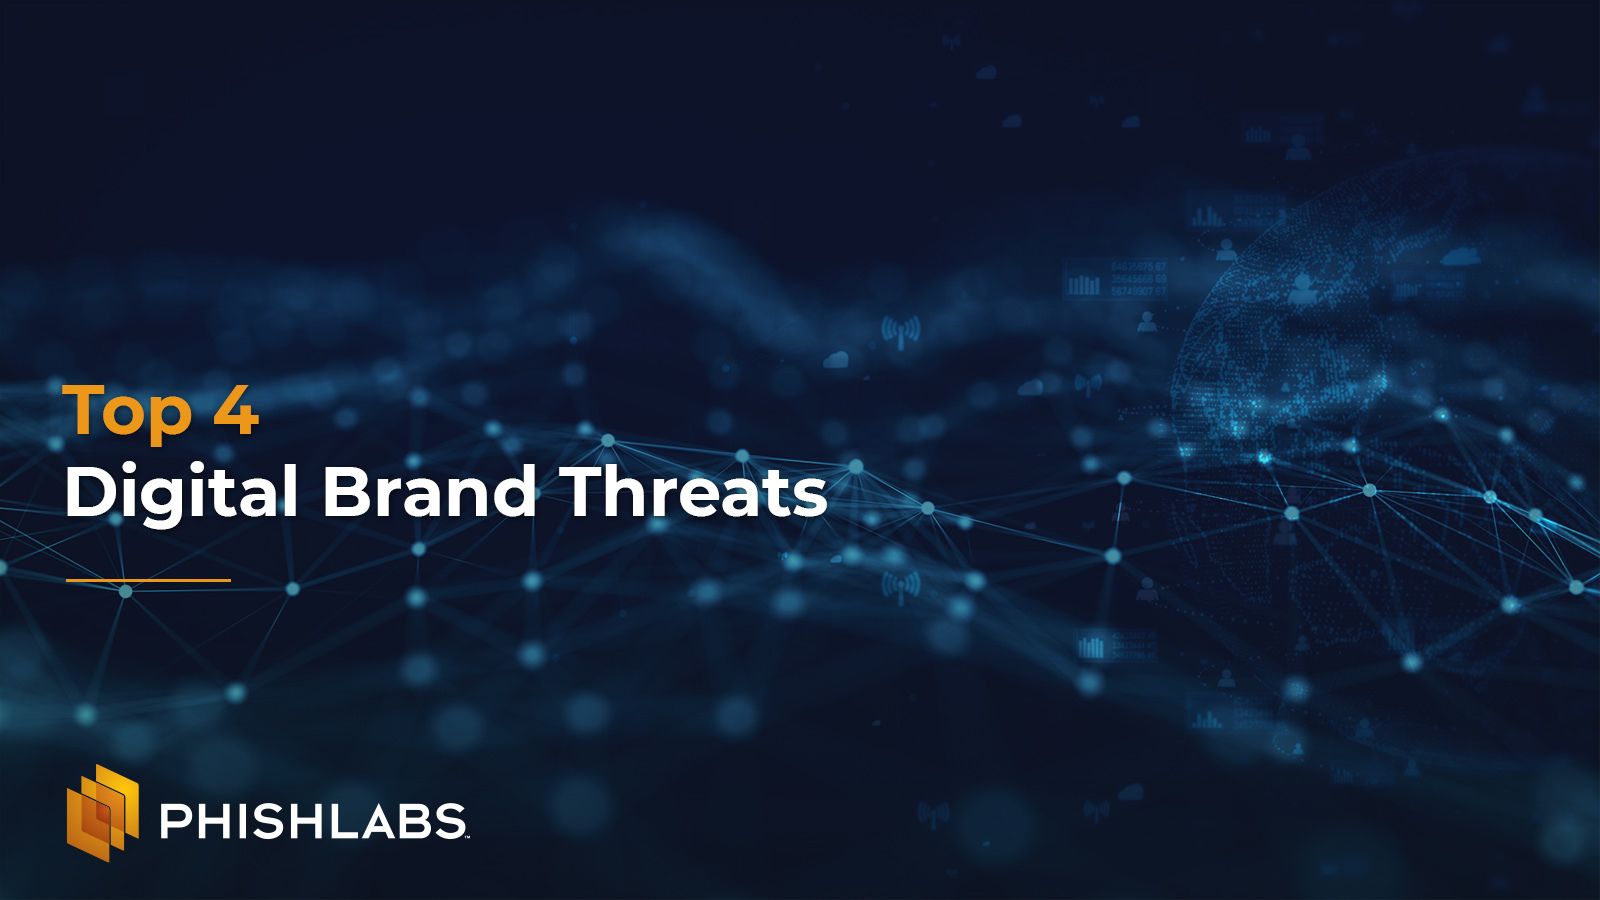 Top 4 Digital Brand Threats